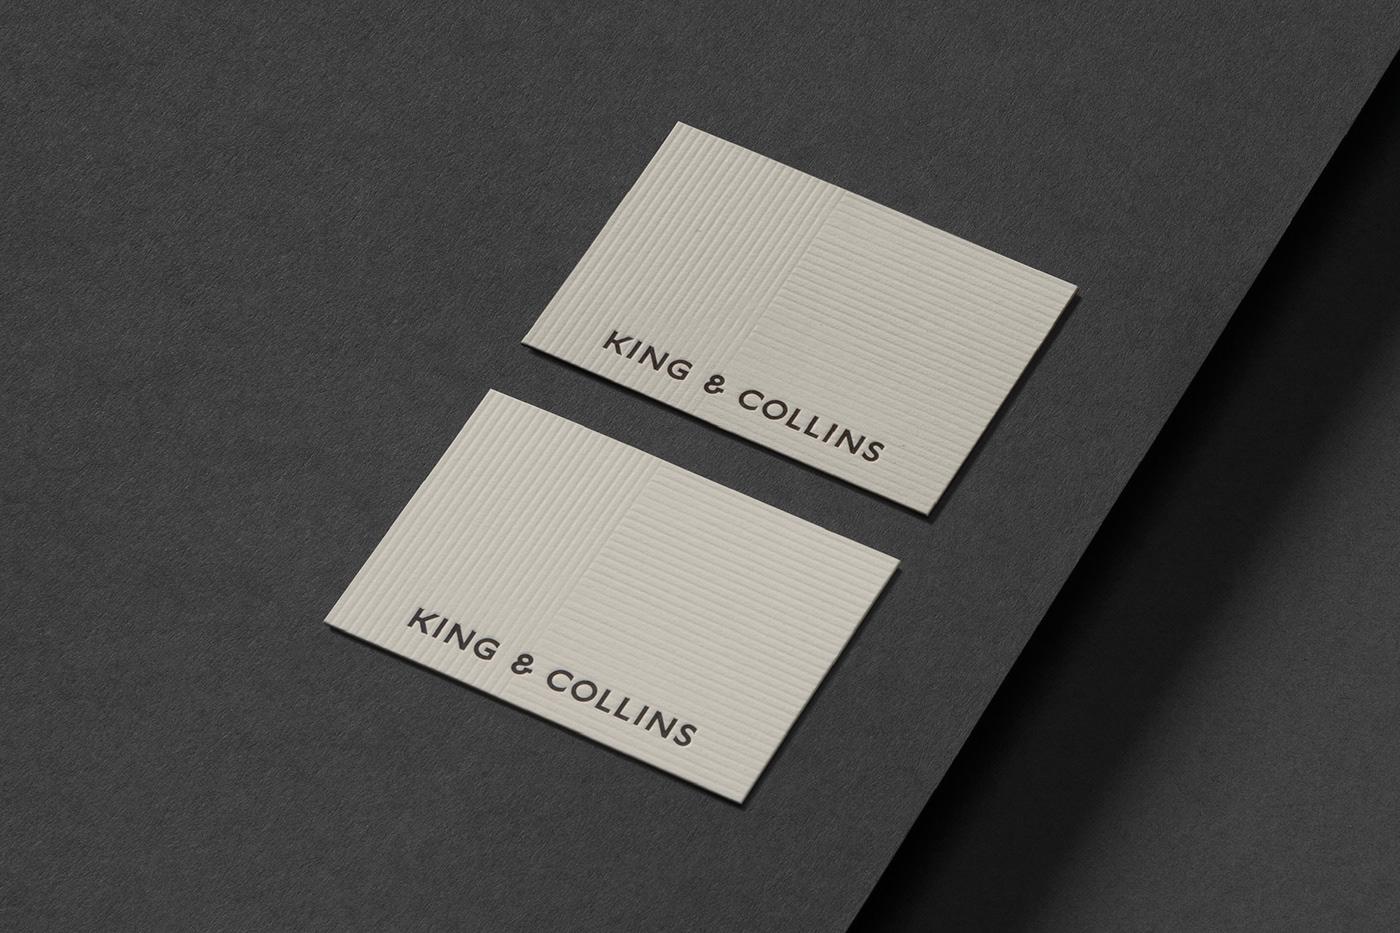 Image may contain: book, handwriting and print